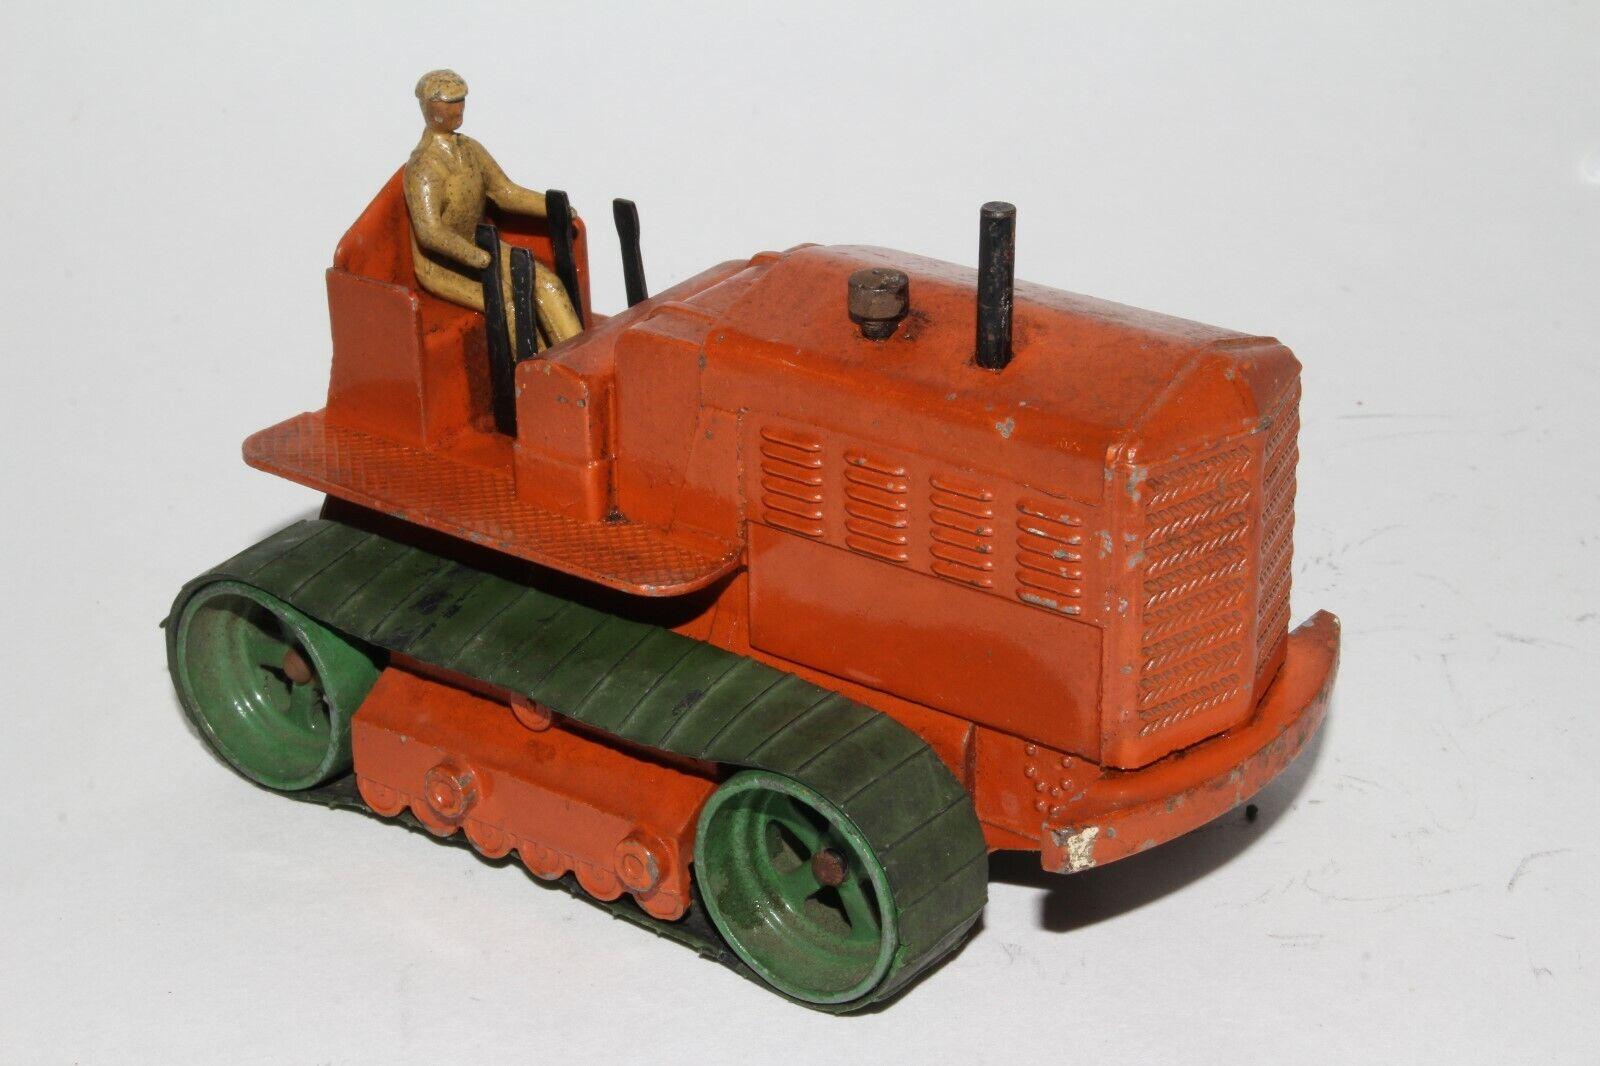 1950's Dinky Supertoy Heavy Tractor, Original